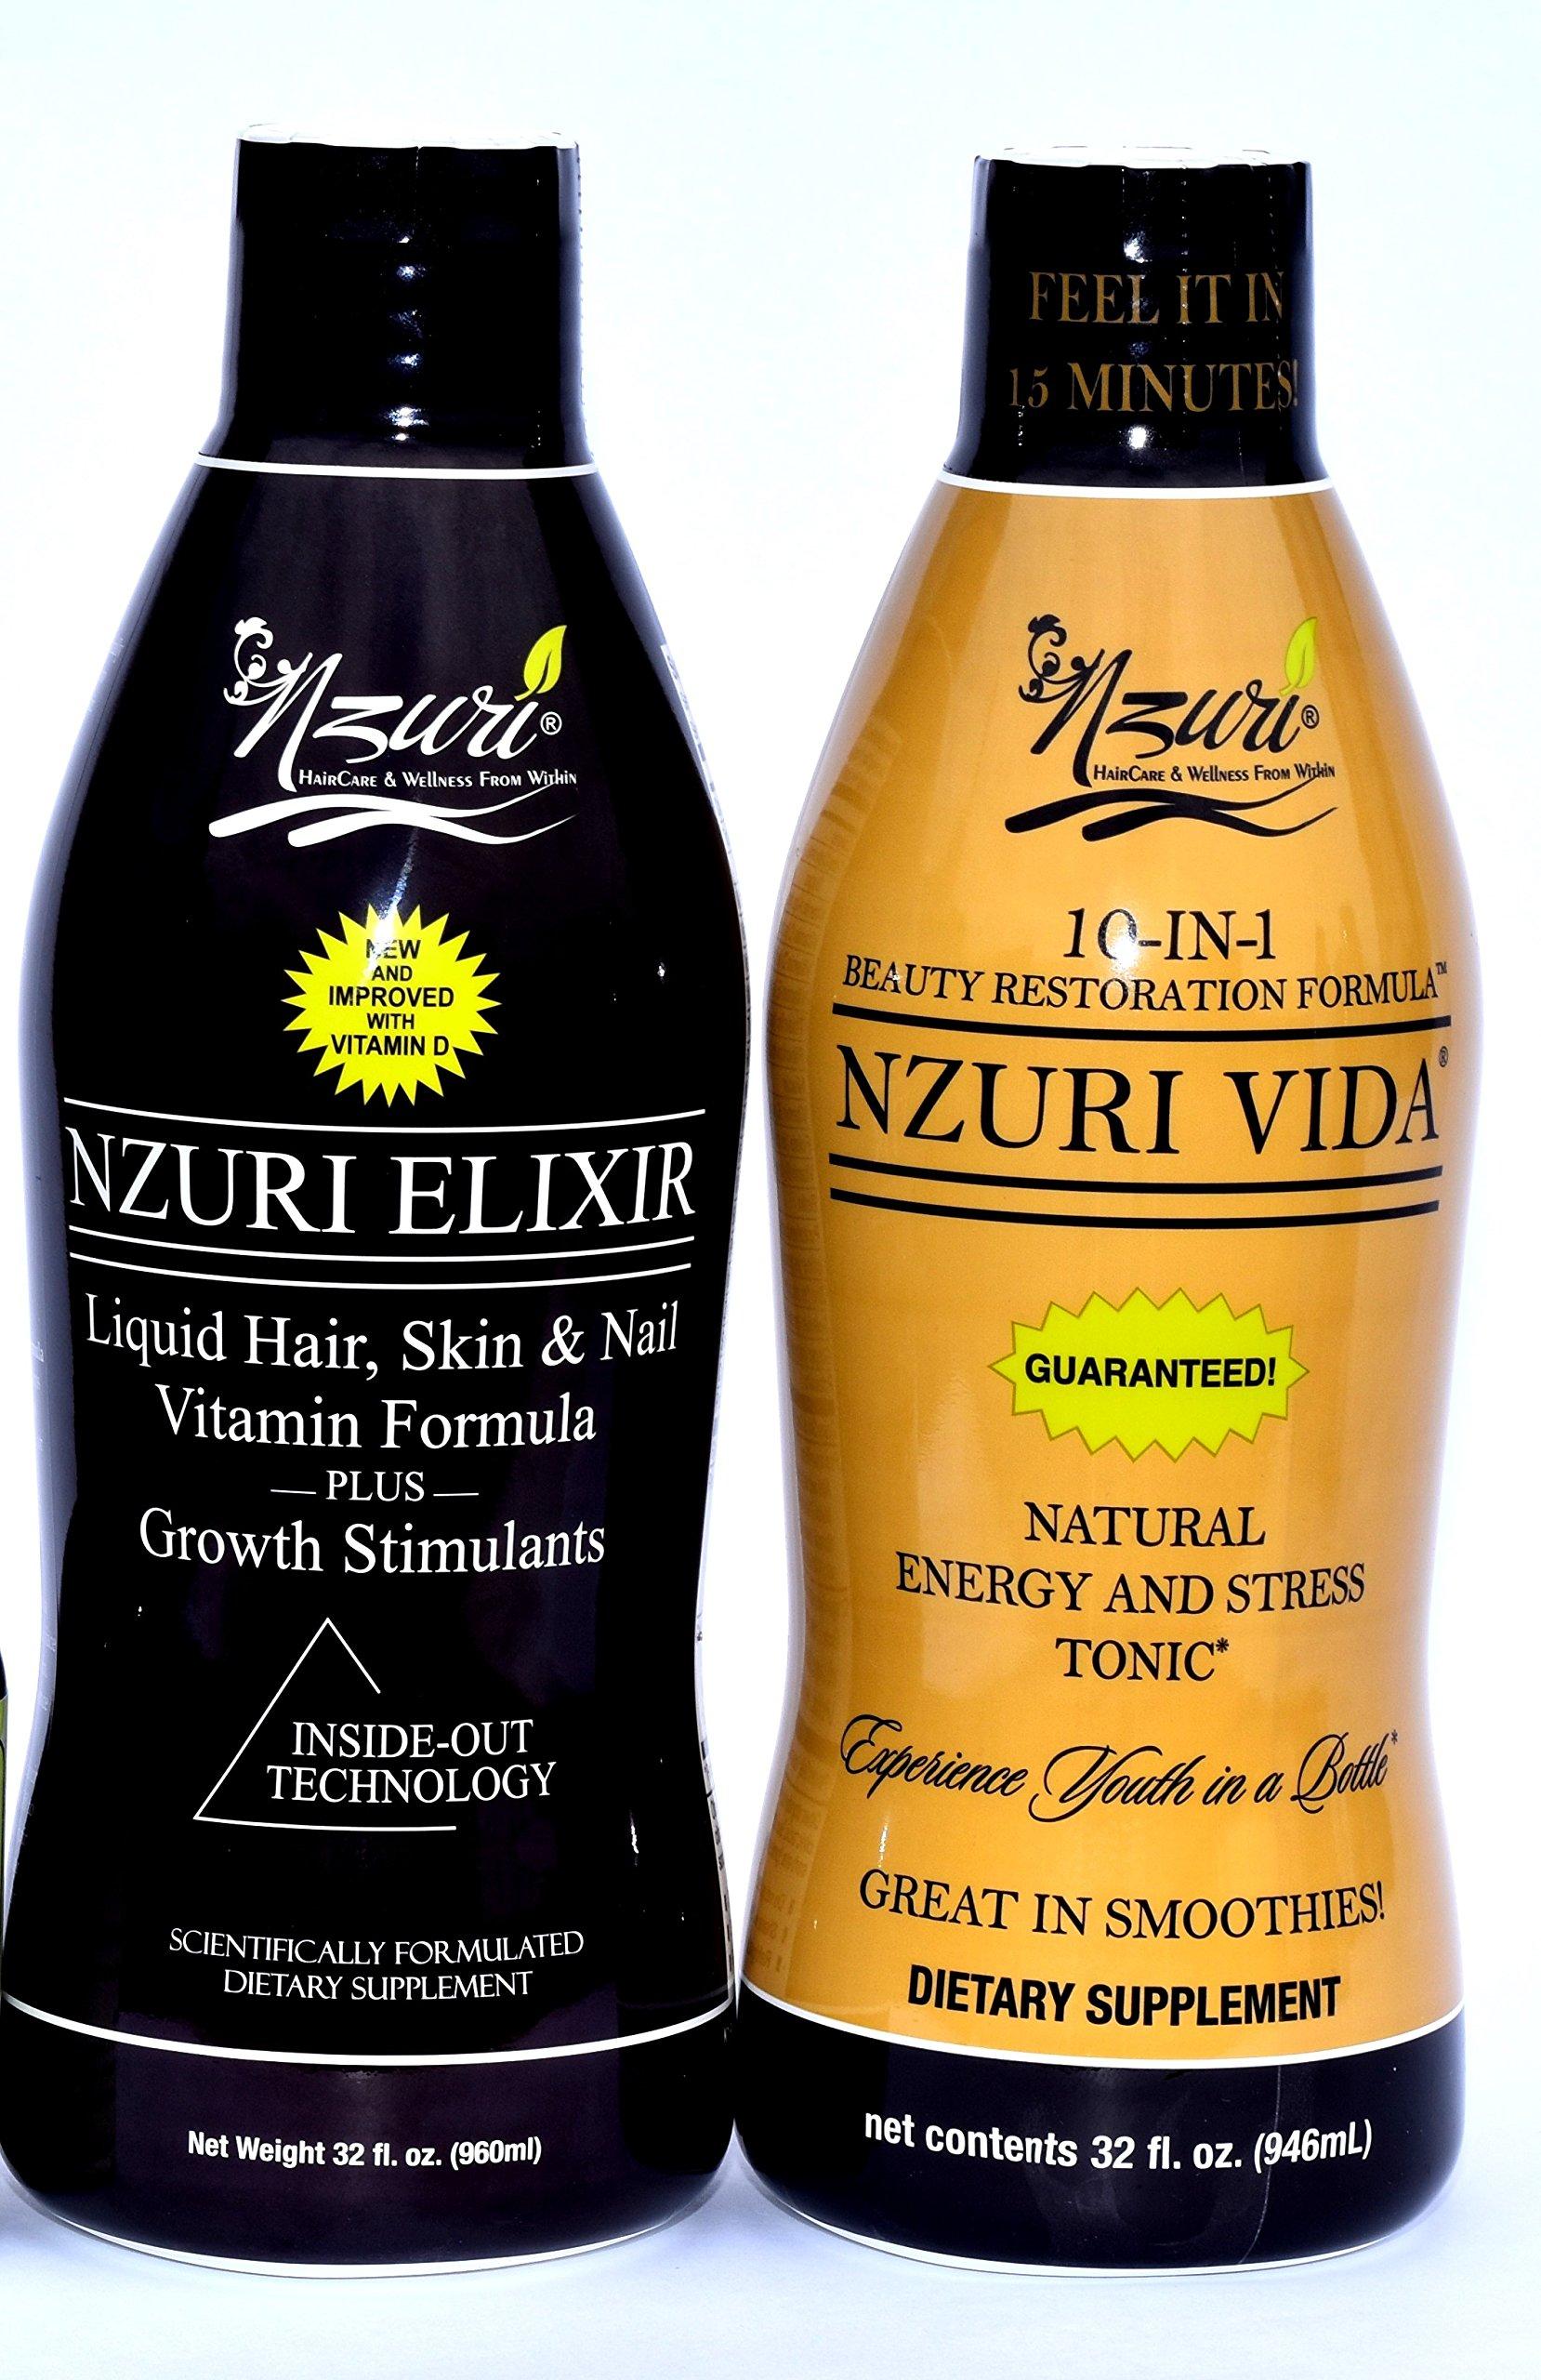 Nzuri Elixir Liquid Hair Vitamins Hair Regrowth 32 Oz Bottle + Nzuri Vida Energy and Stress Tonic 30 Oz Bottle - The Perfect Duo